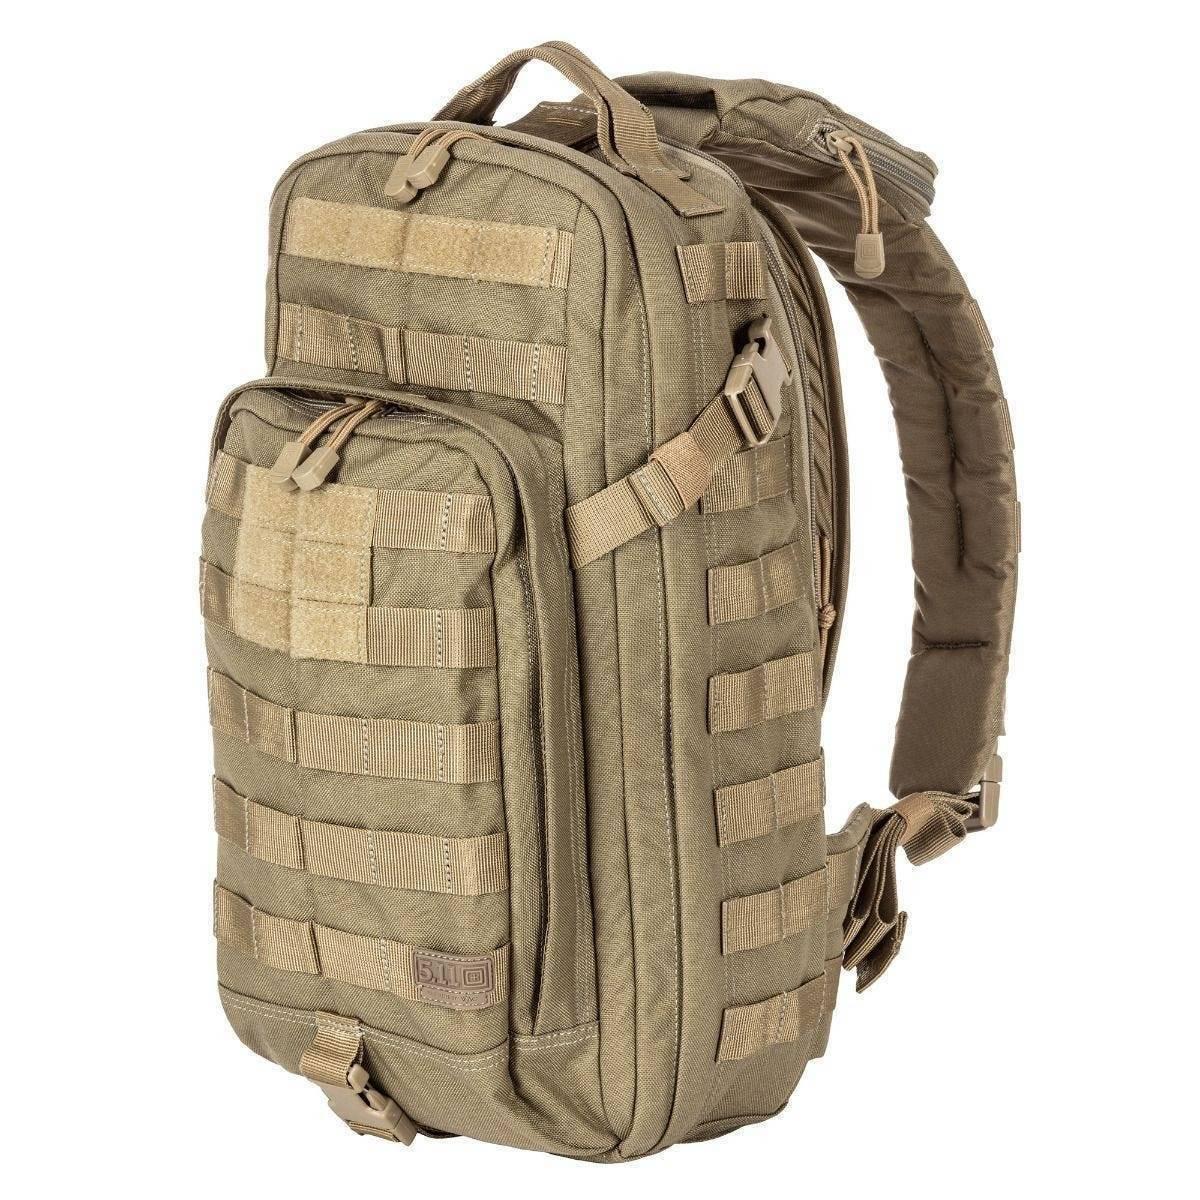 5.11 Tactical Rush MOAB 10 Sandstone